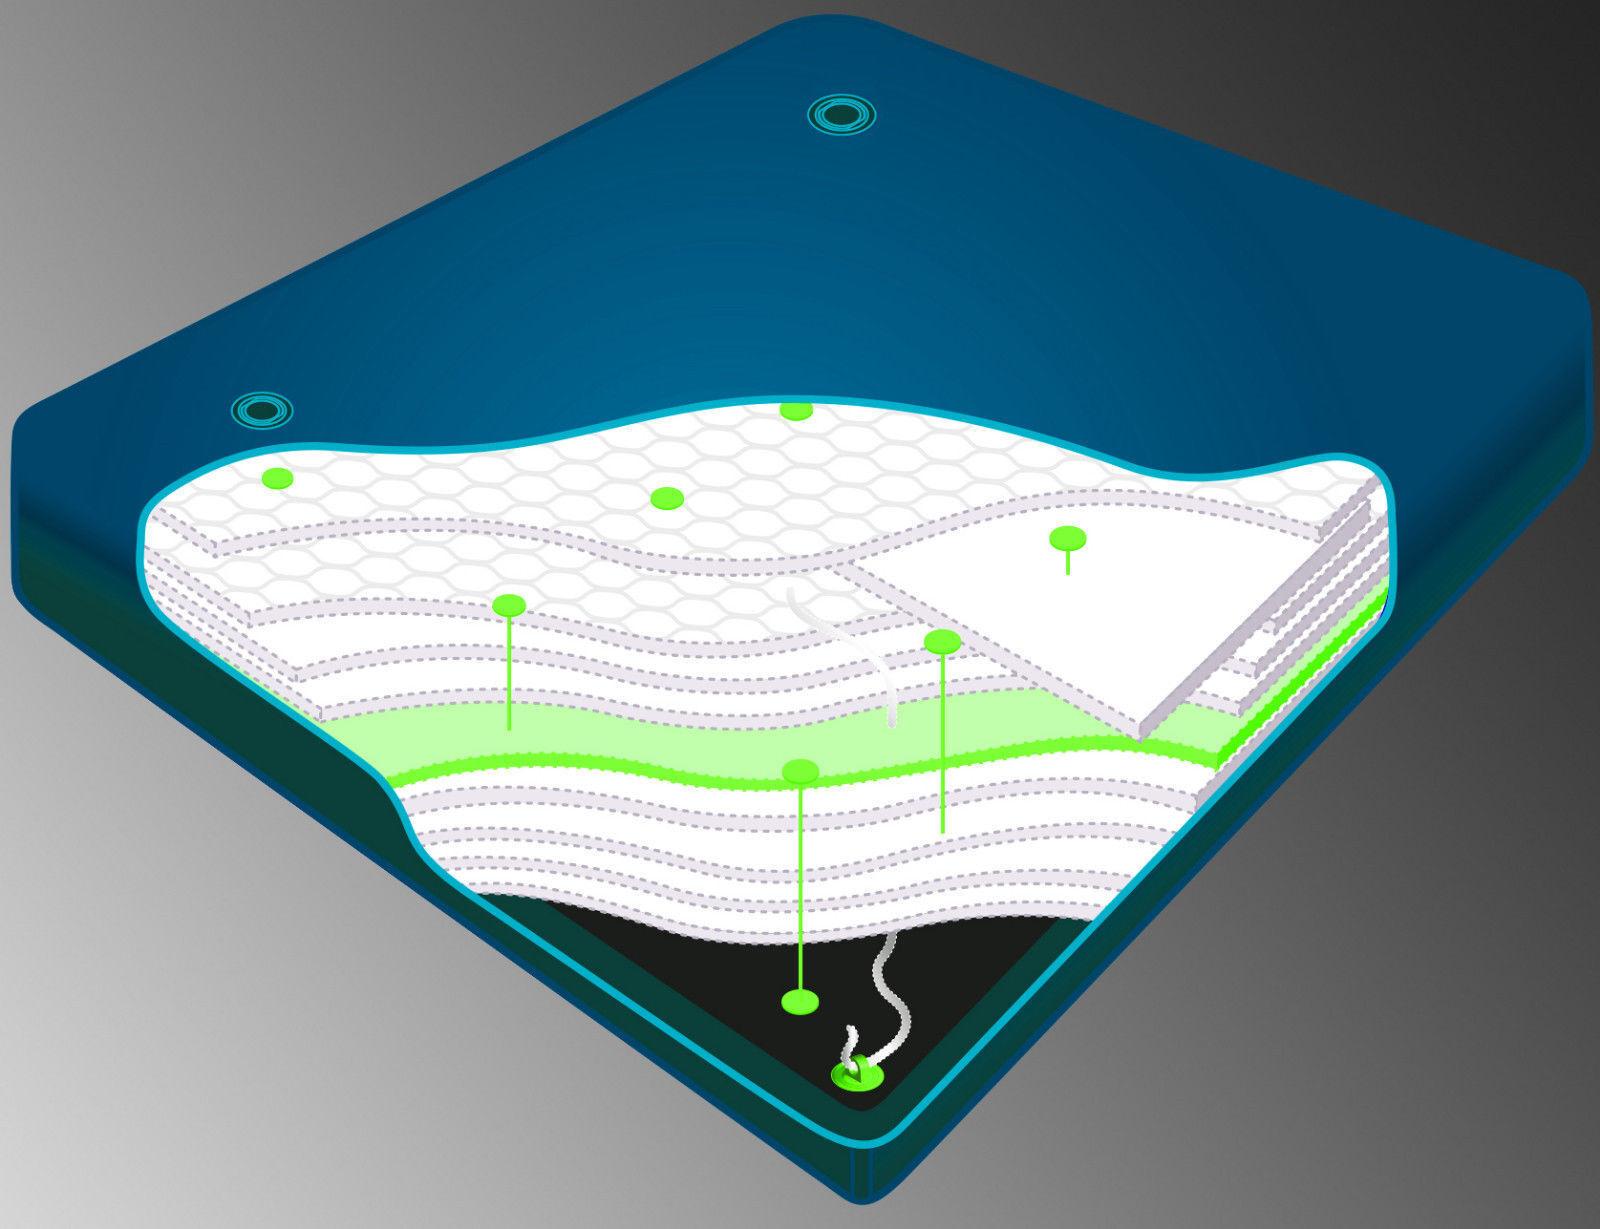 Beddream Wasserkern matratze SOFTSIDE MONO 160-220 x 200-220 cm